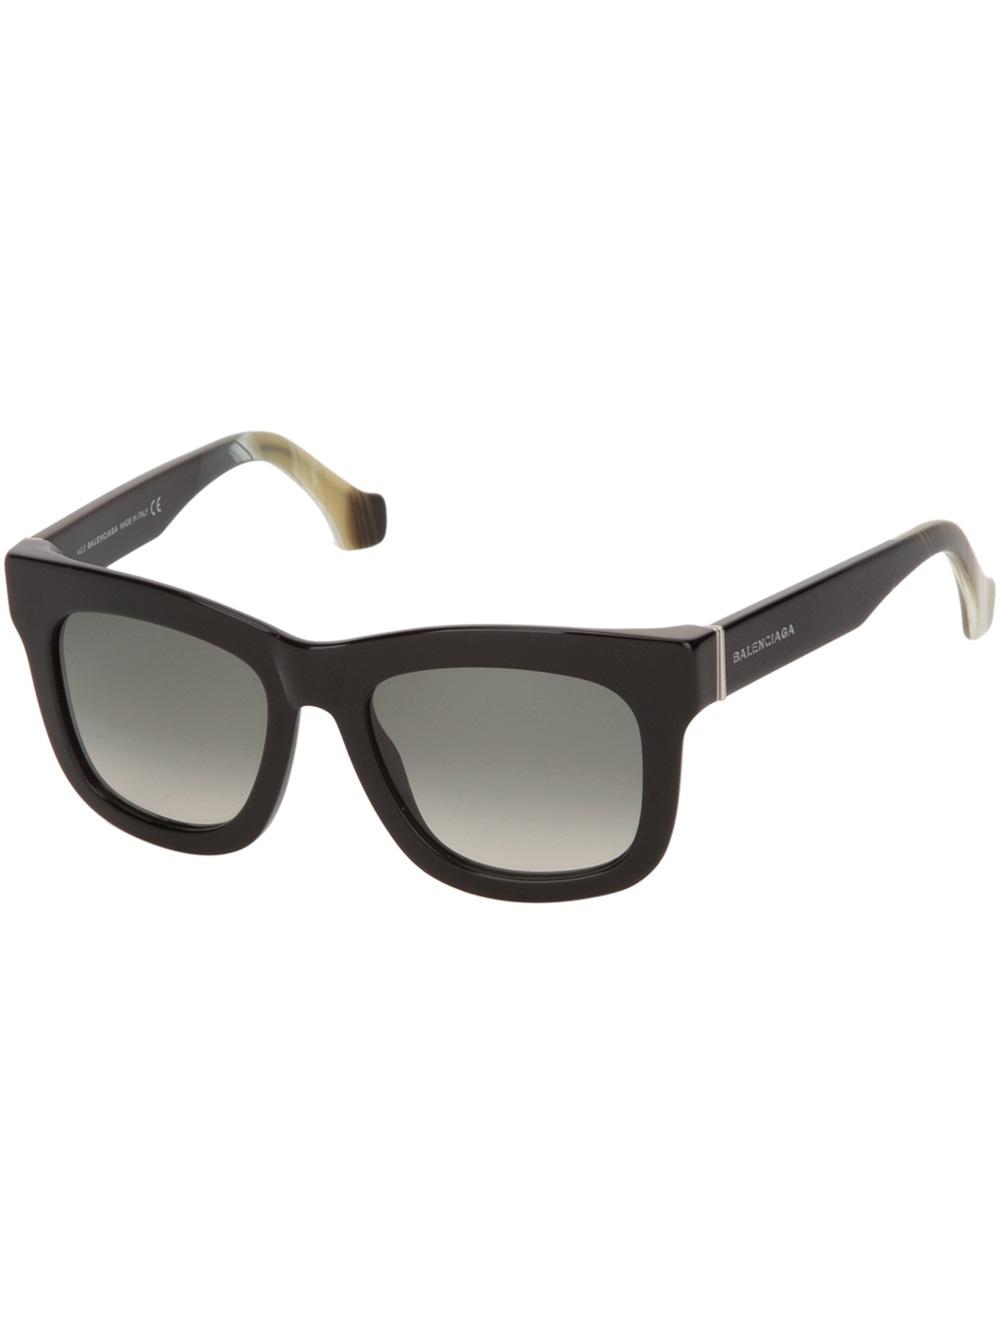 63dfc3852a8f5 Balenciaga Sunglasses For Men